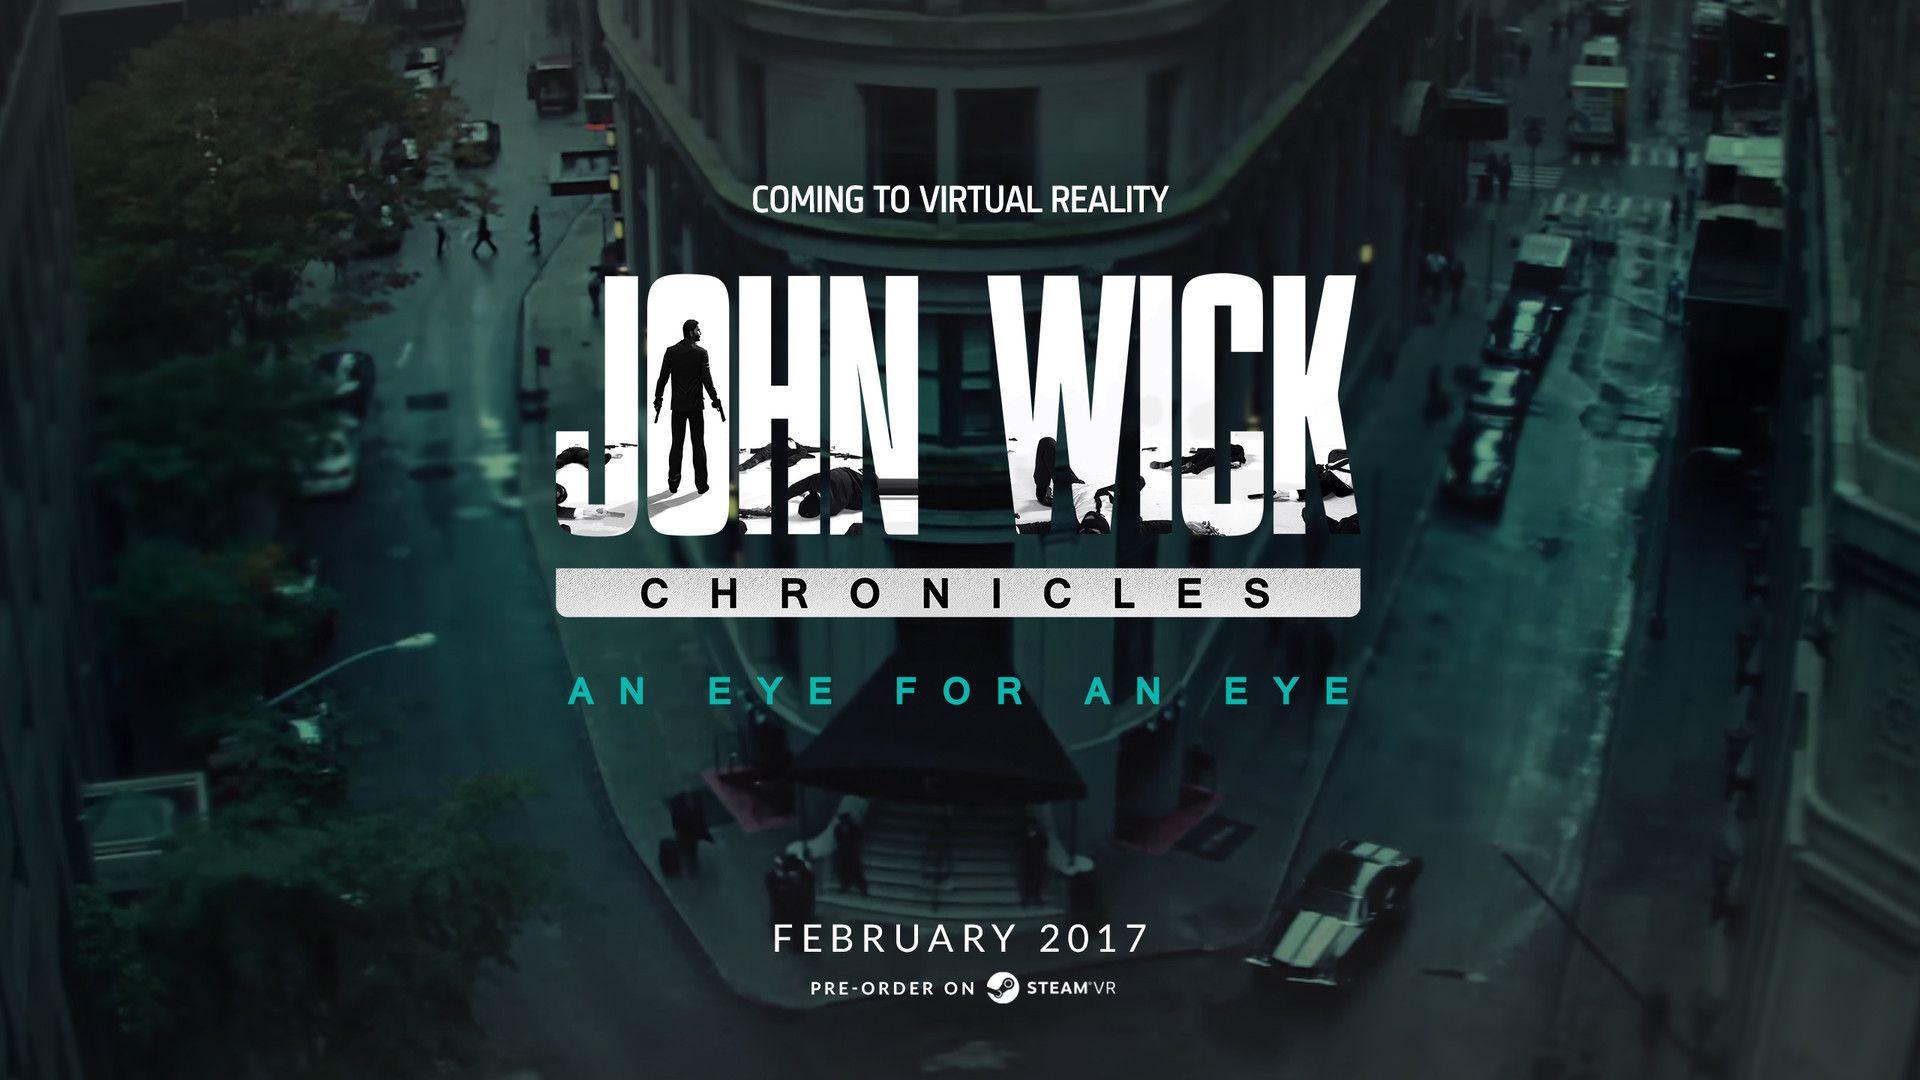 John Wick Chronicles Shooter game, Virtual reality, John